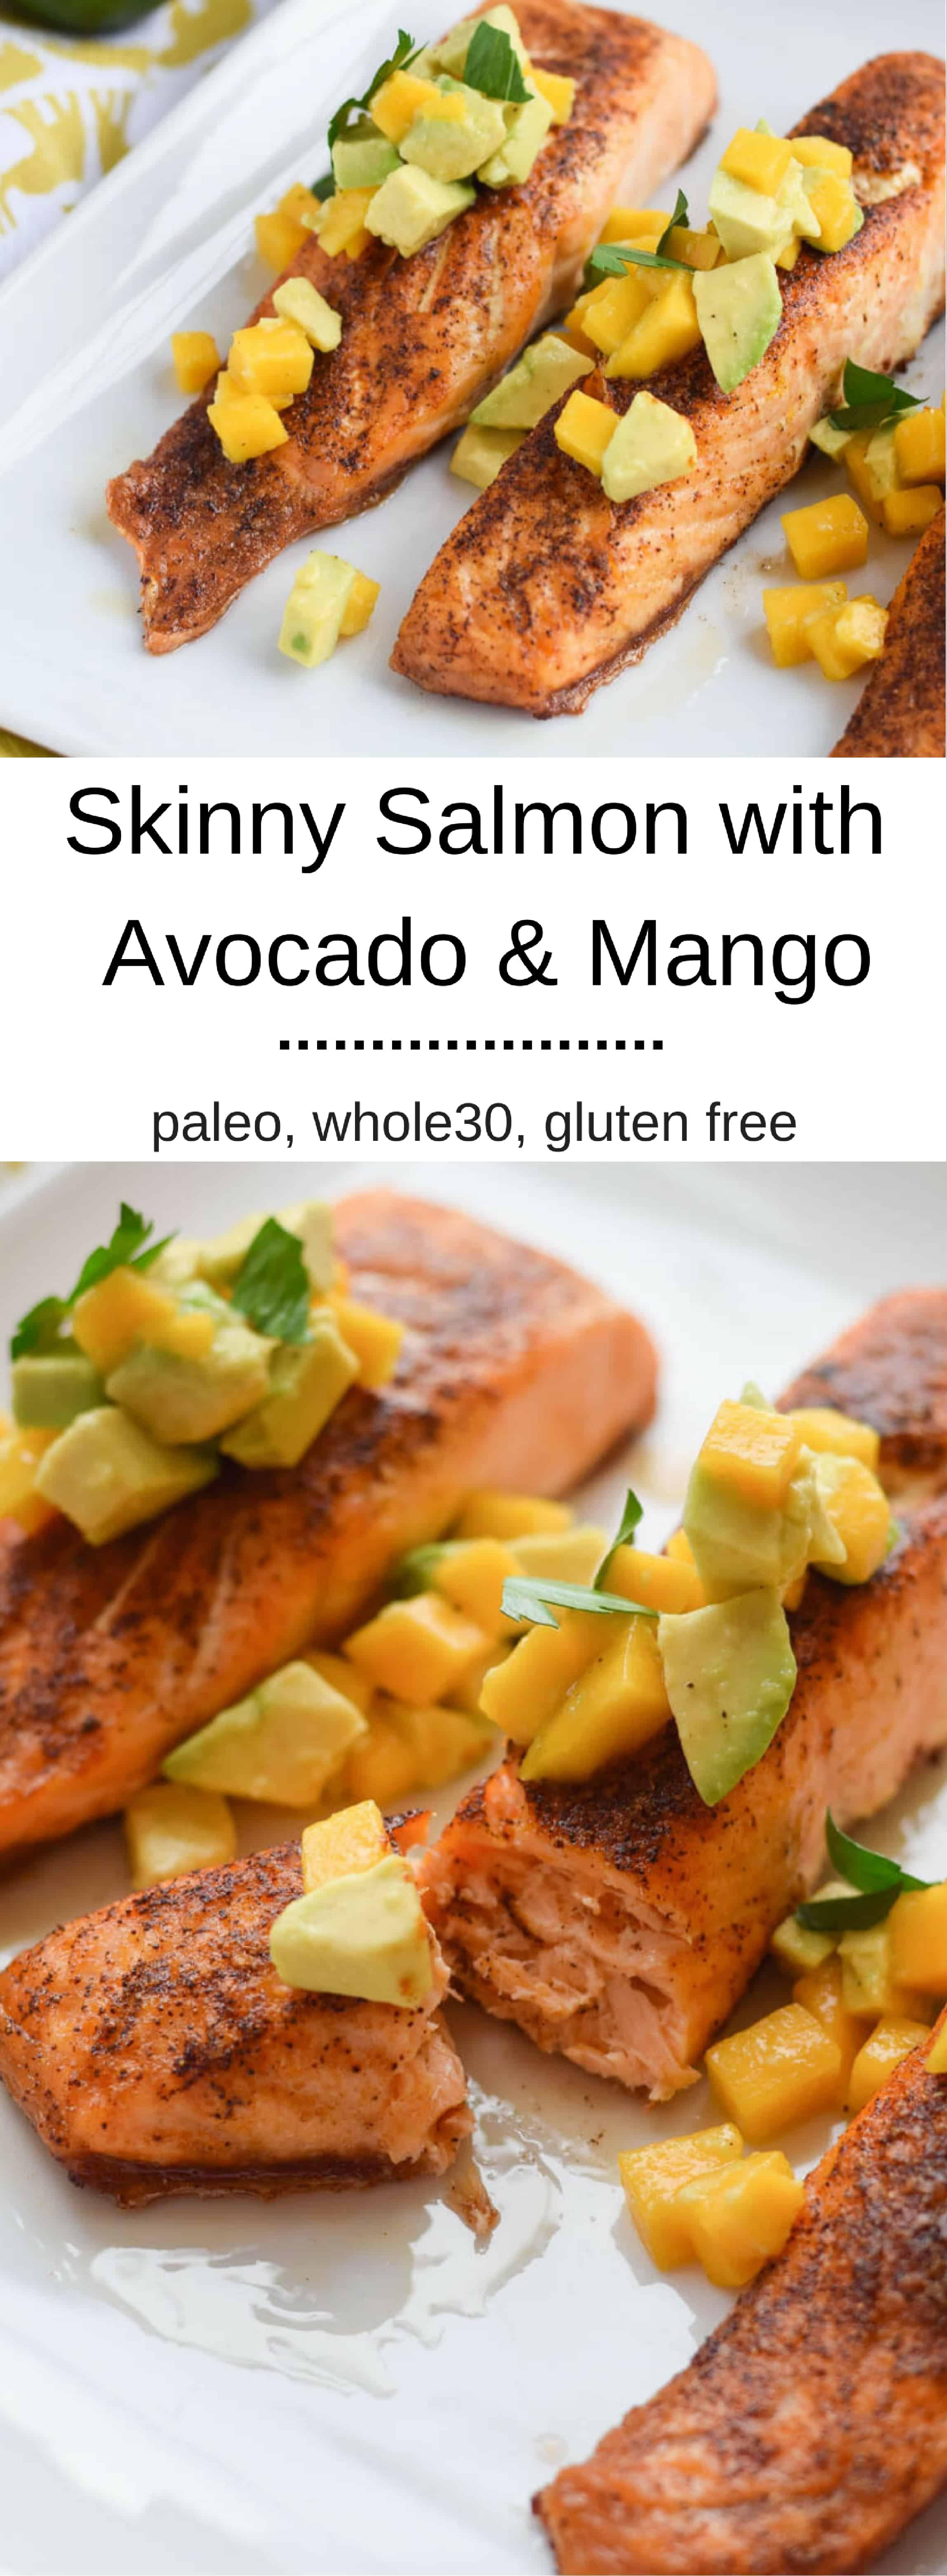 Skinny Salmon with Avocado and Mango